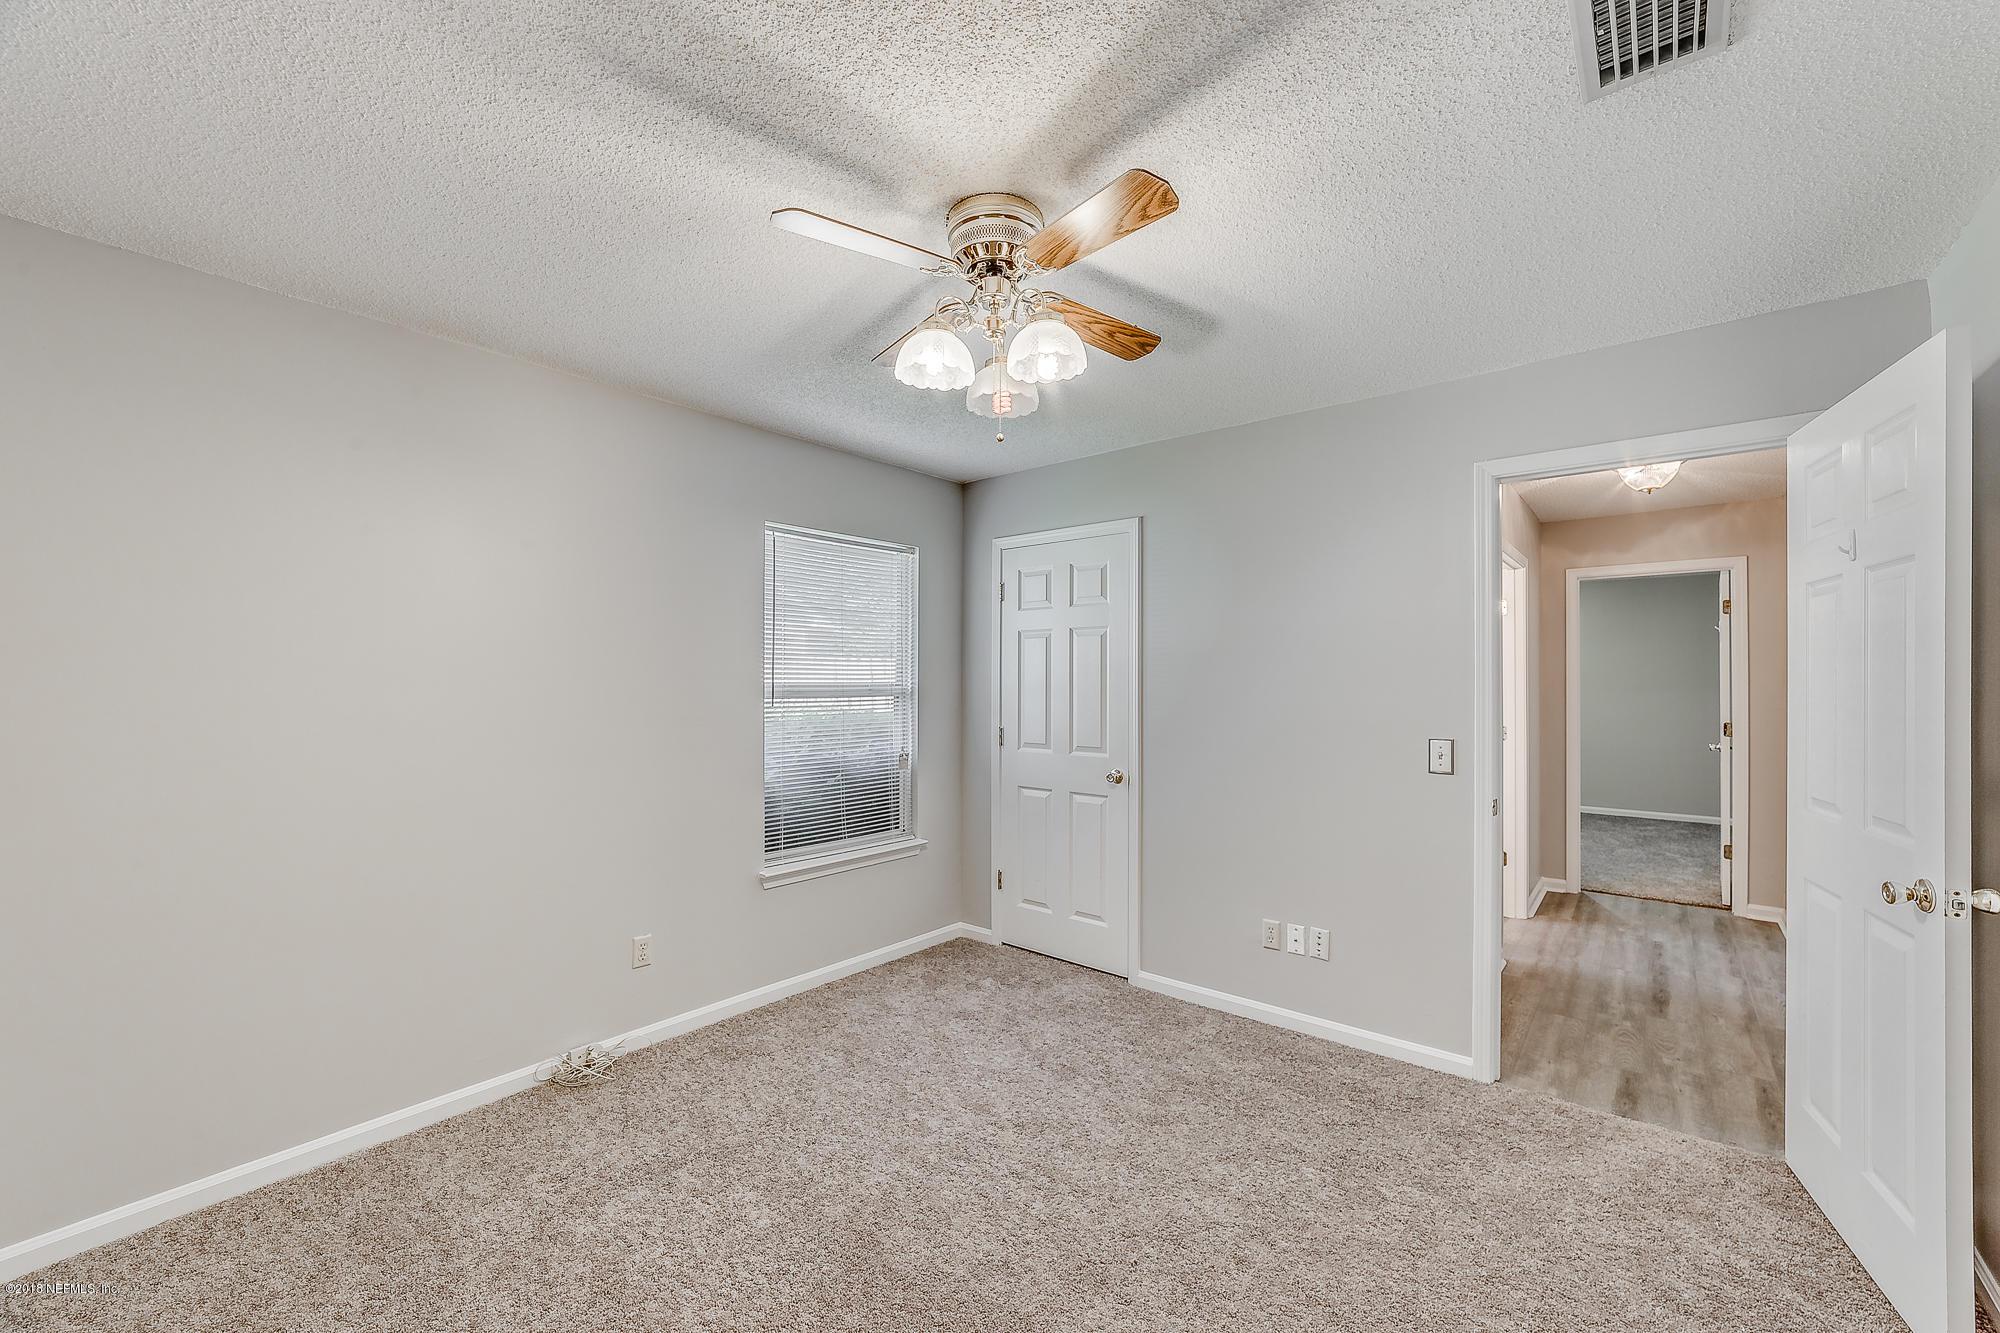 5013 RIPPLE RUSH, JACKSONVILLE, FLORIDA 32257, 3 Bedrooms Bedrooms, ,2 BathroomsBathrooms,Residential - single family,For sale,RIPPLE RUSH,966183